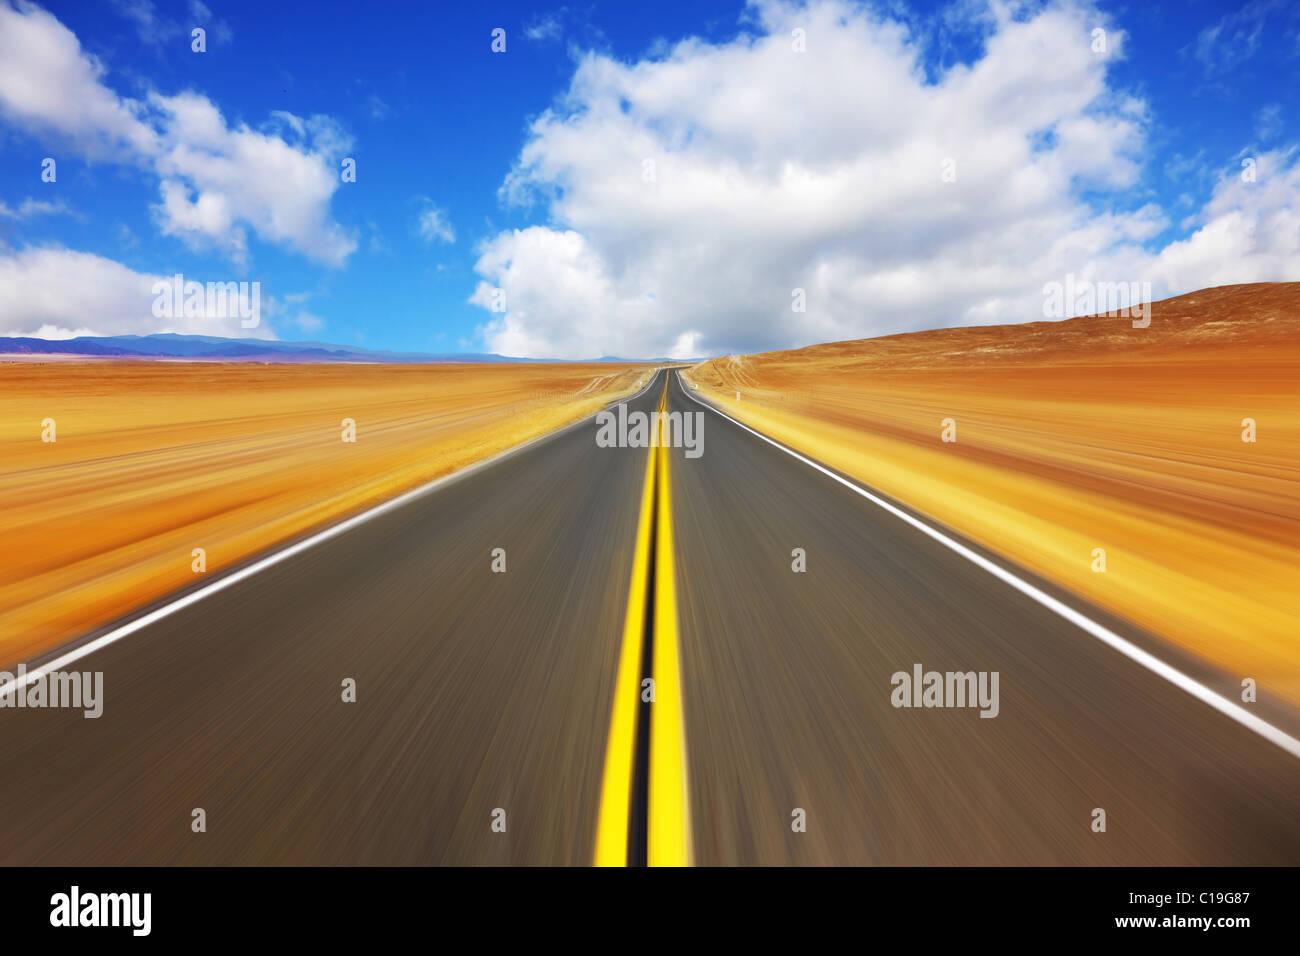 Mirage on high speed in desert - Stock Image